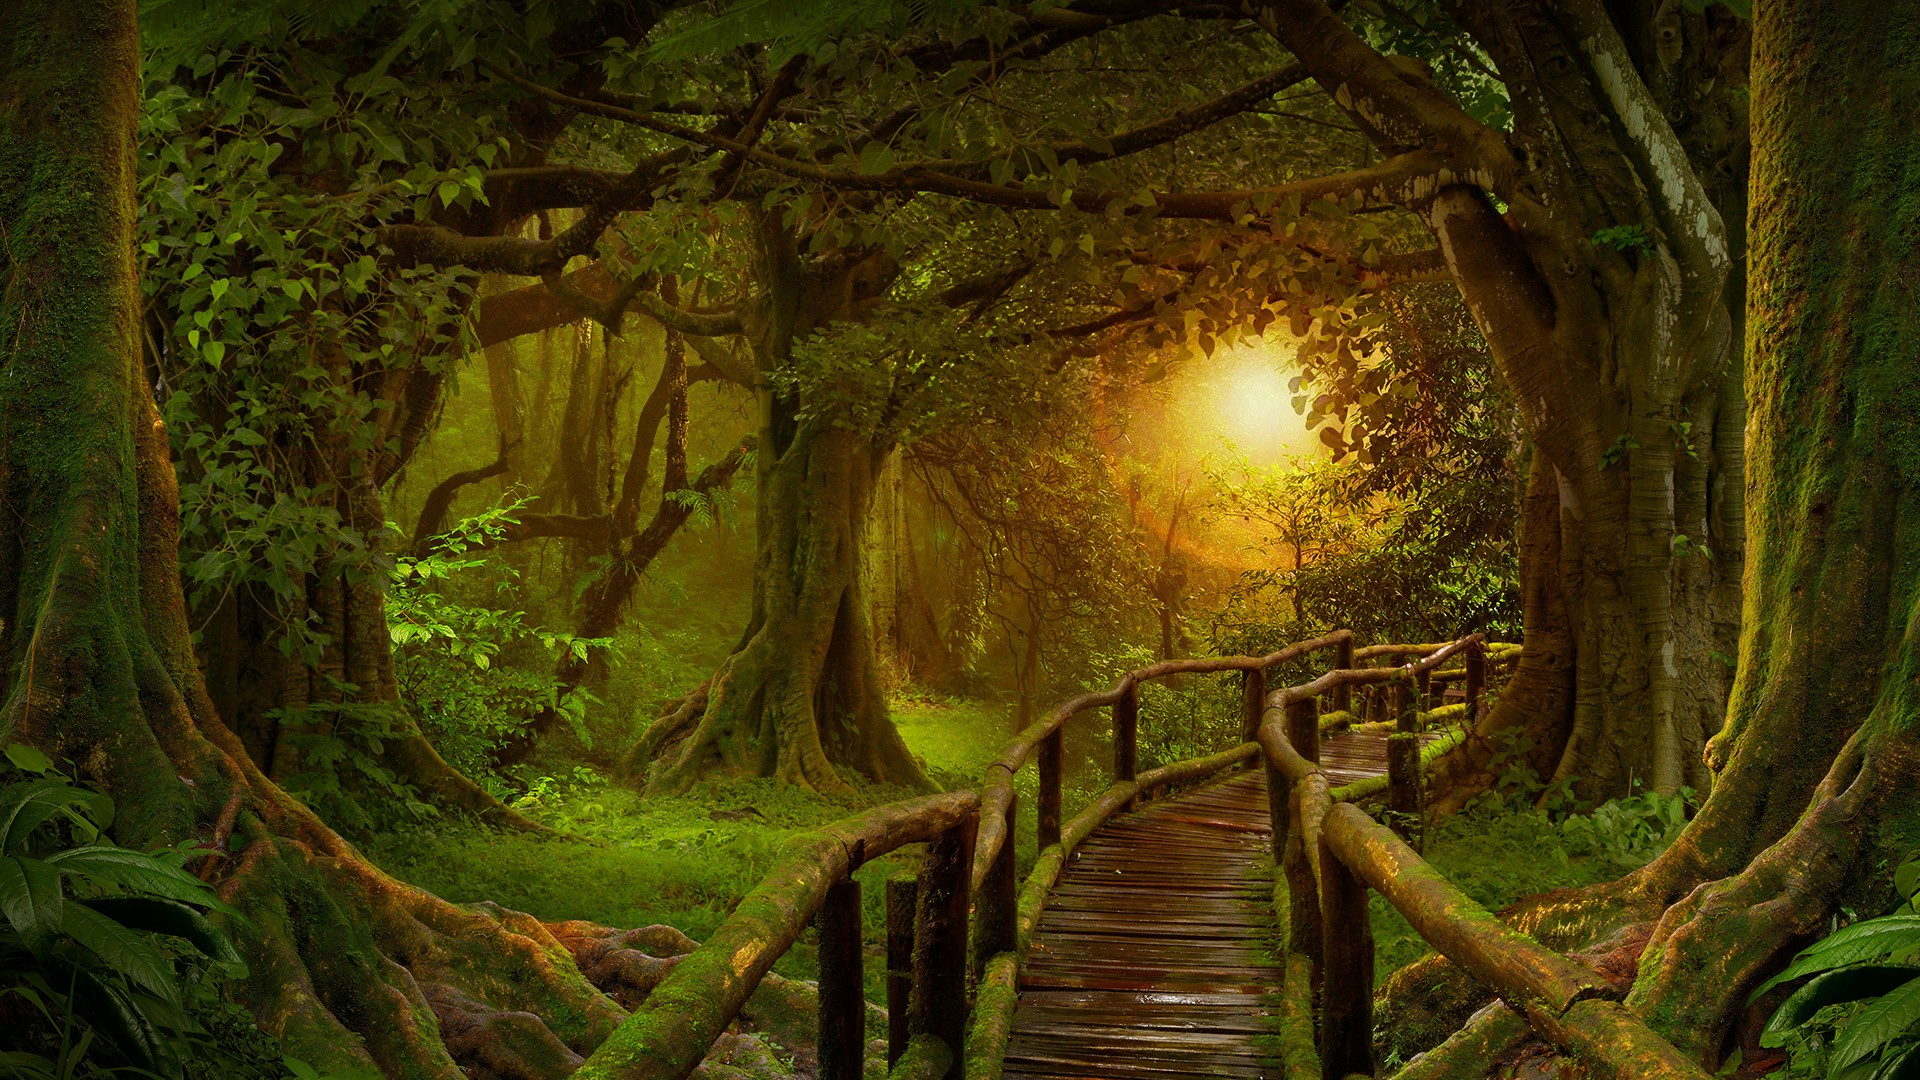 General 1920x1080 nature landscape forest plants wooden bridge wood planks leaves trees Sun moss